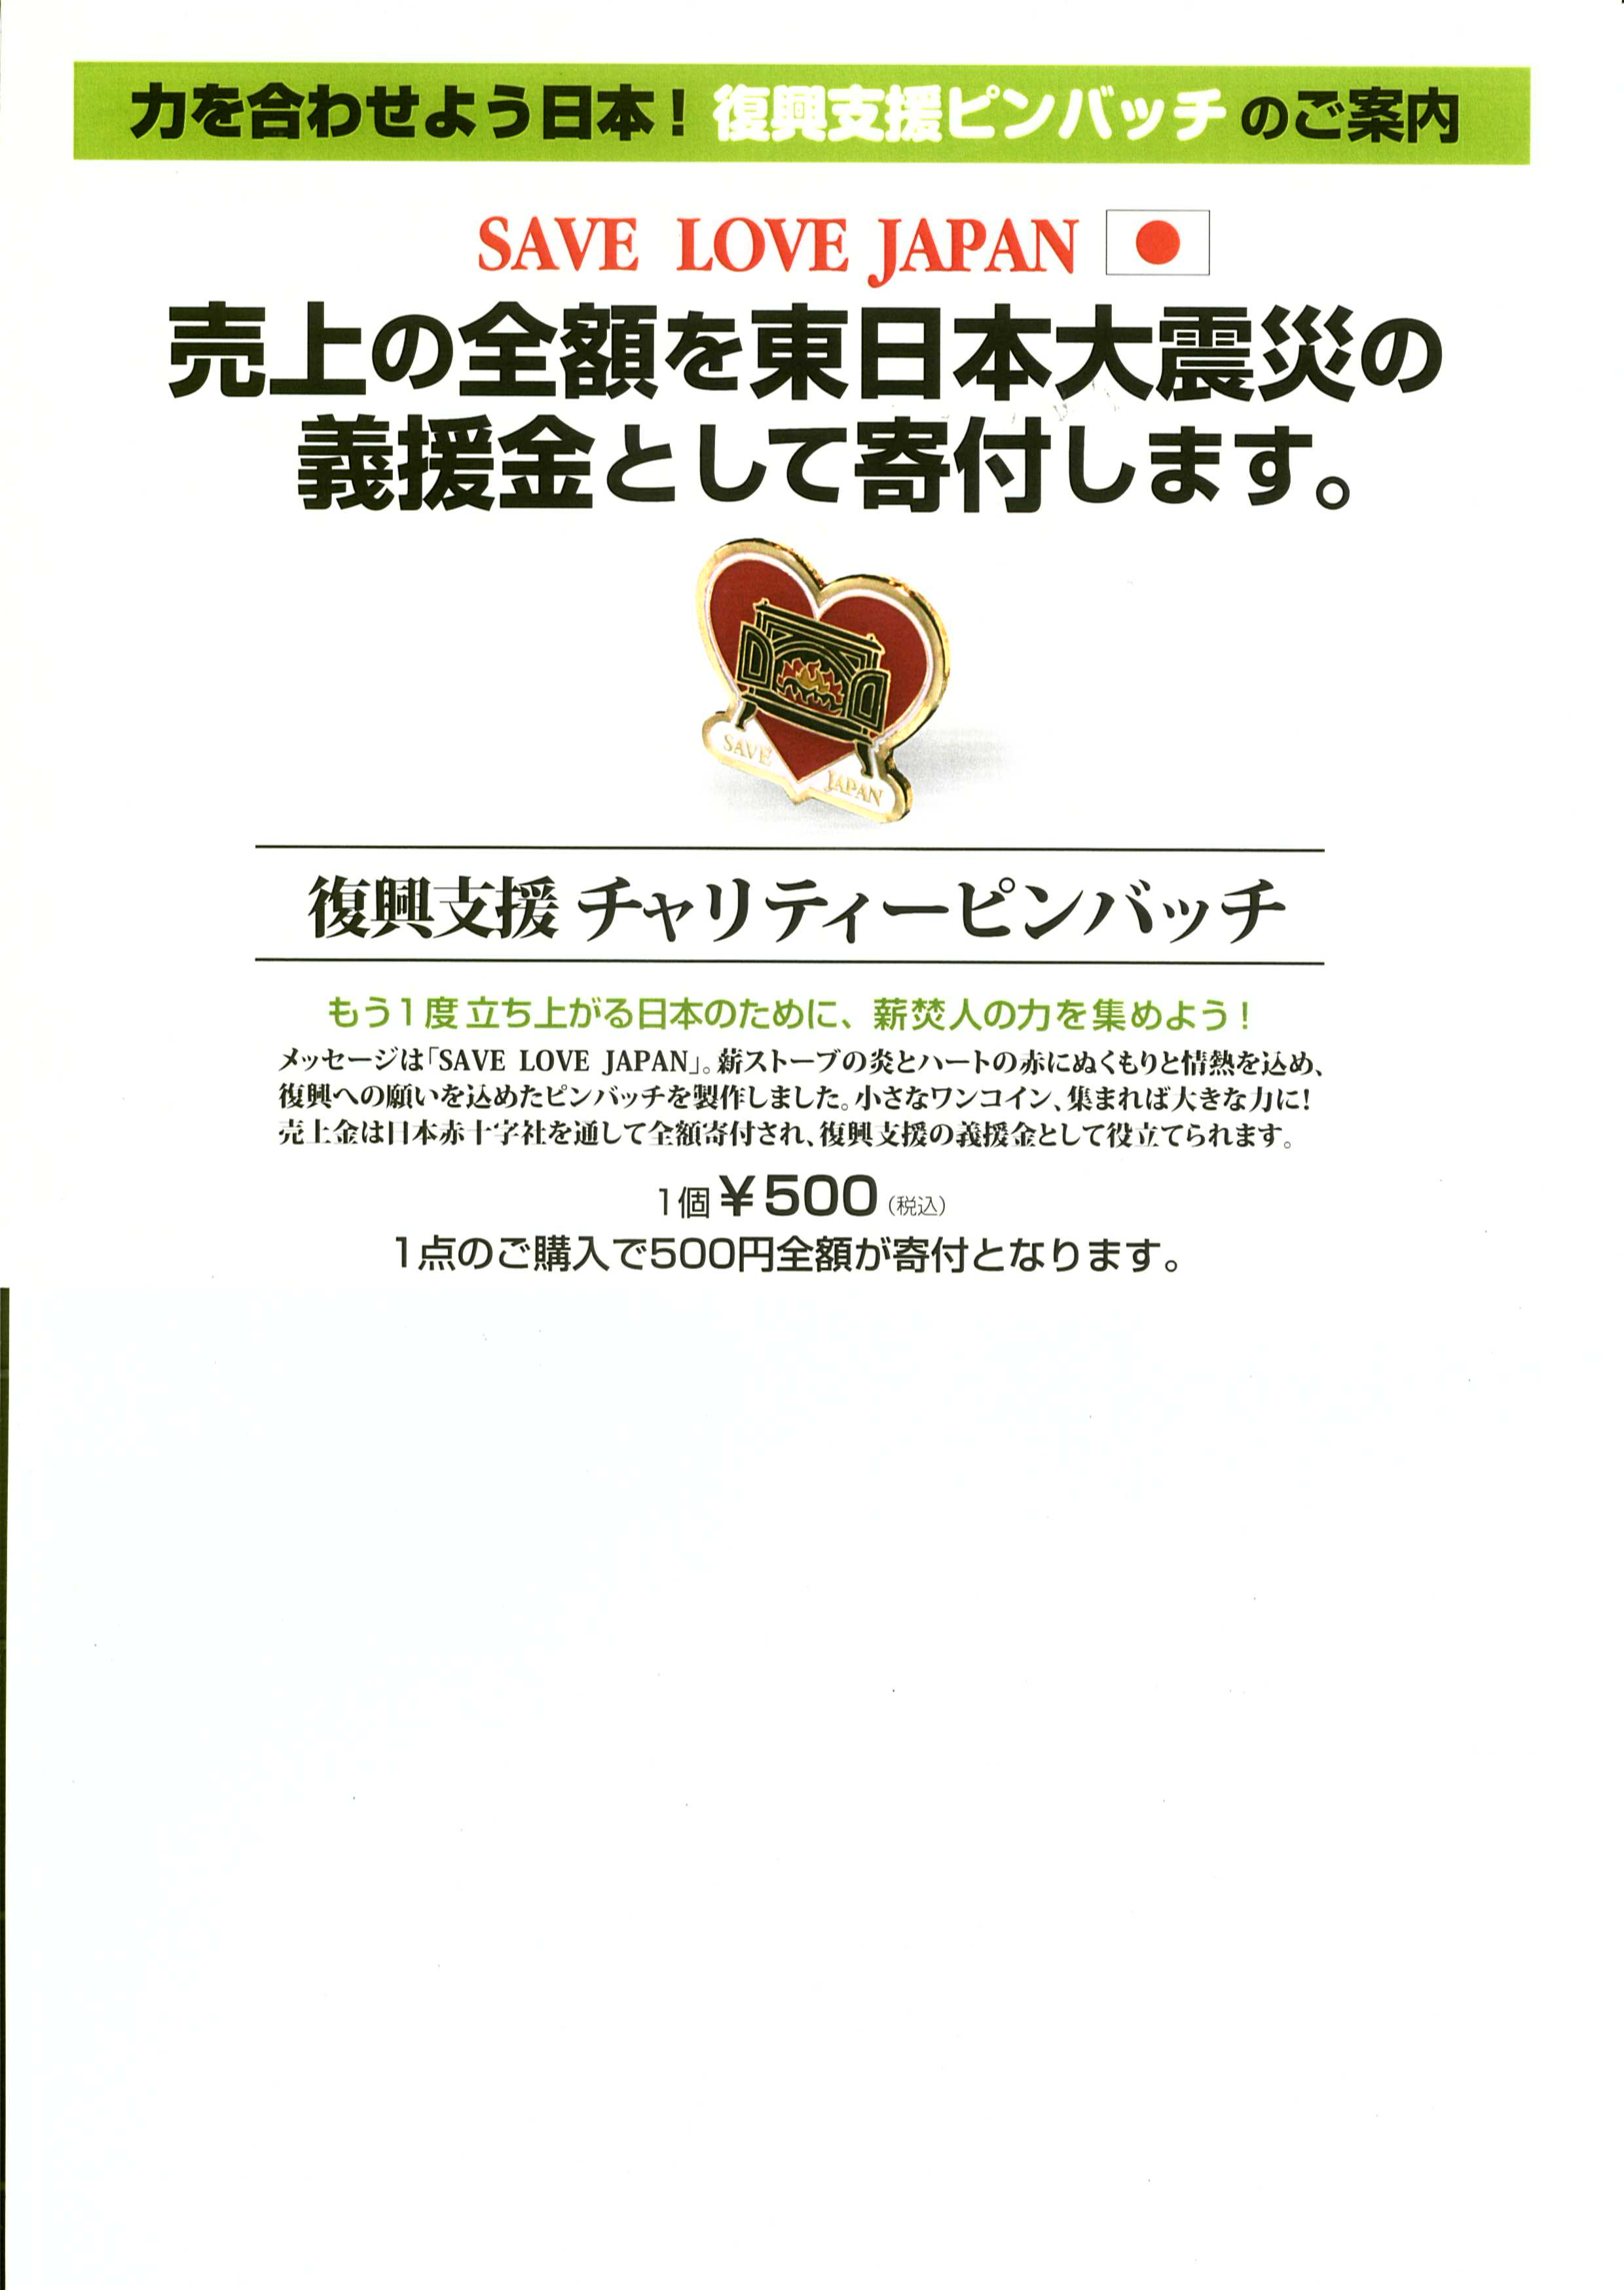 20110501103313-1